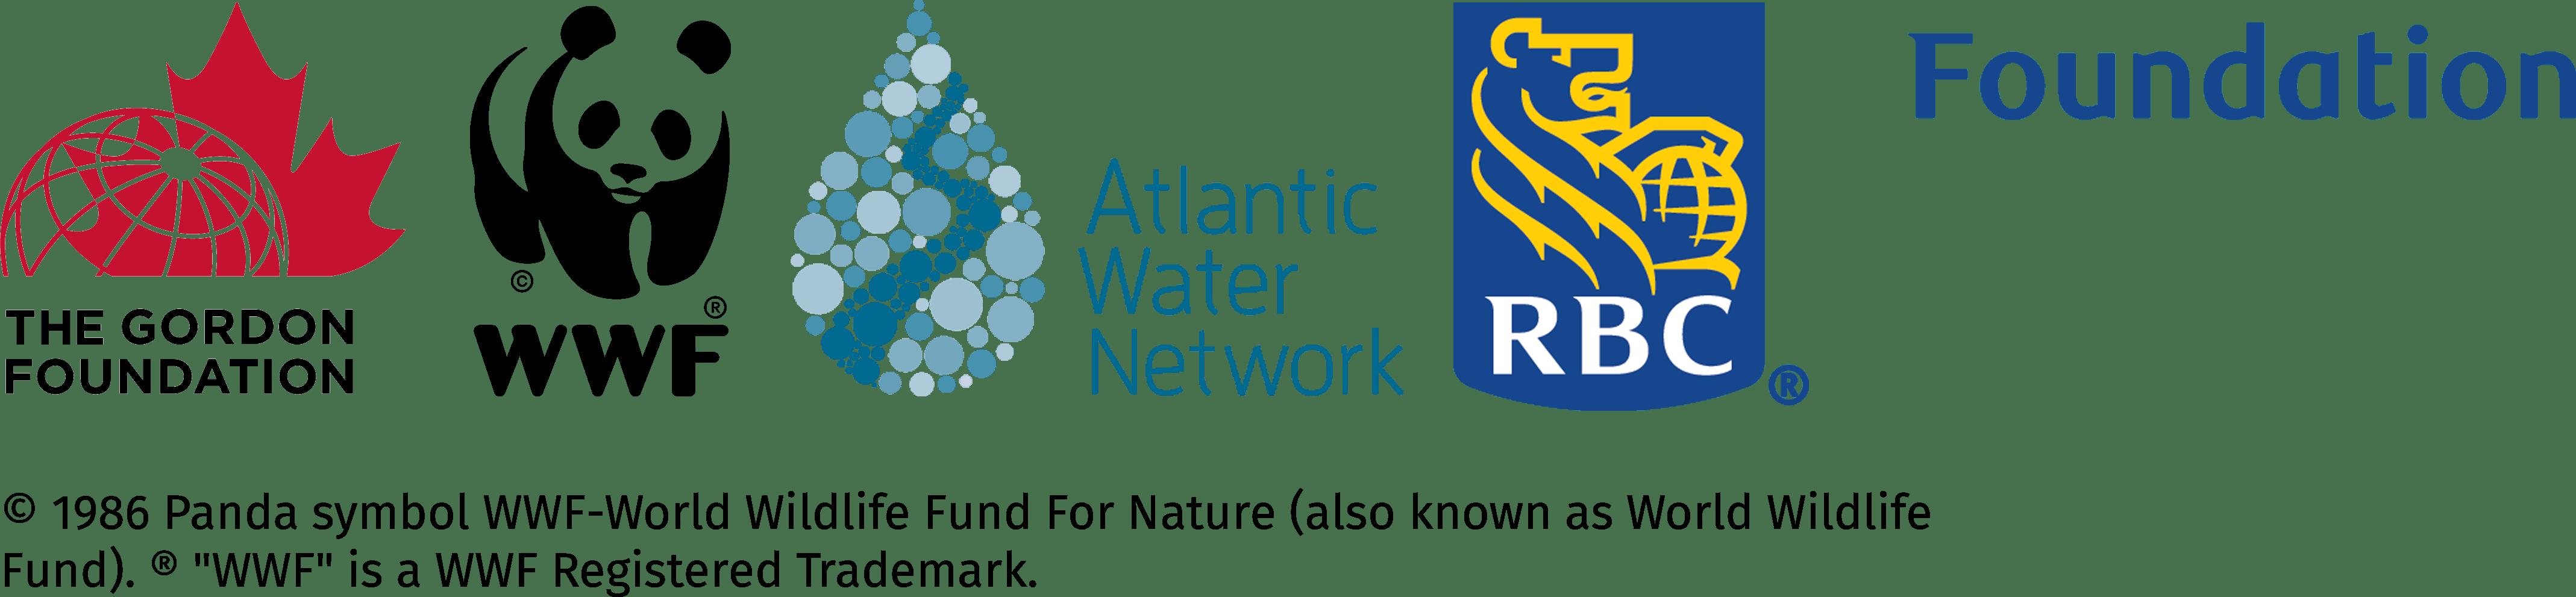 Logos for The Gordon Foundation, World Wildlife Fund, Atlantic Water Network and RBC Foundation